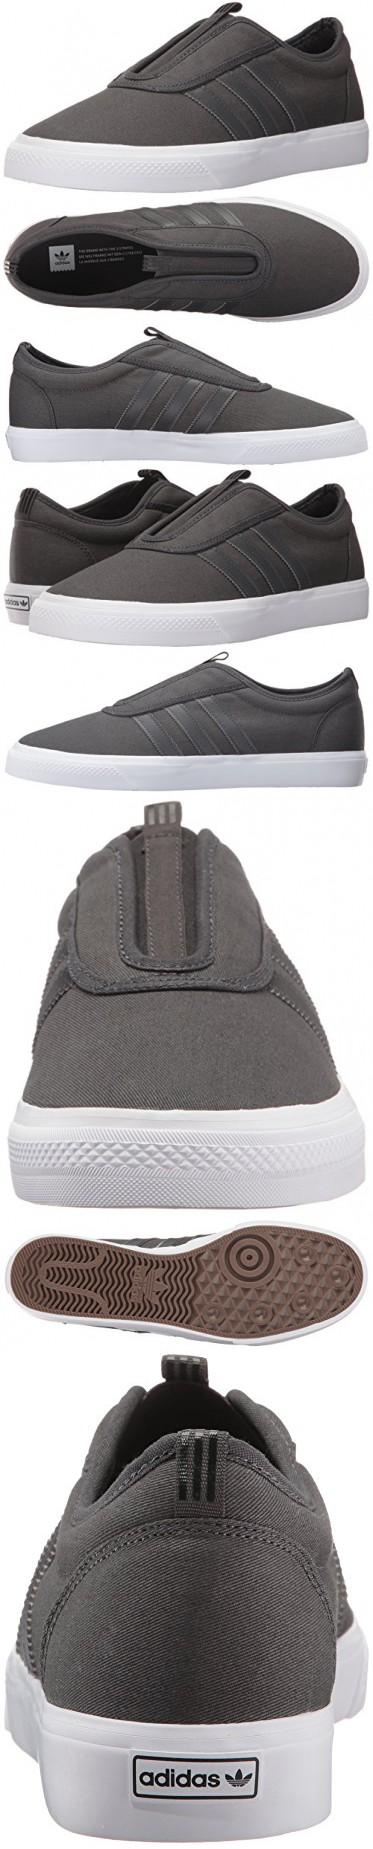 adidas originali uomini dga - kung fu scarpa, solido grigio scuro